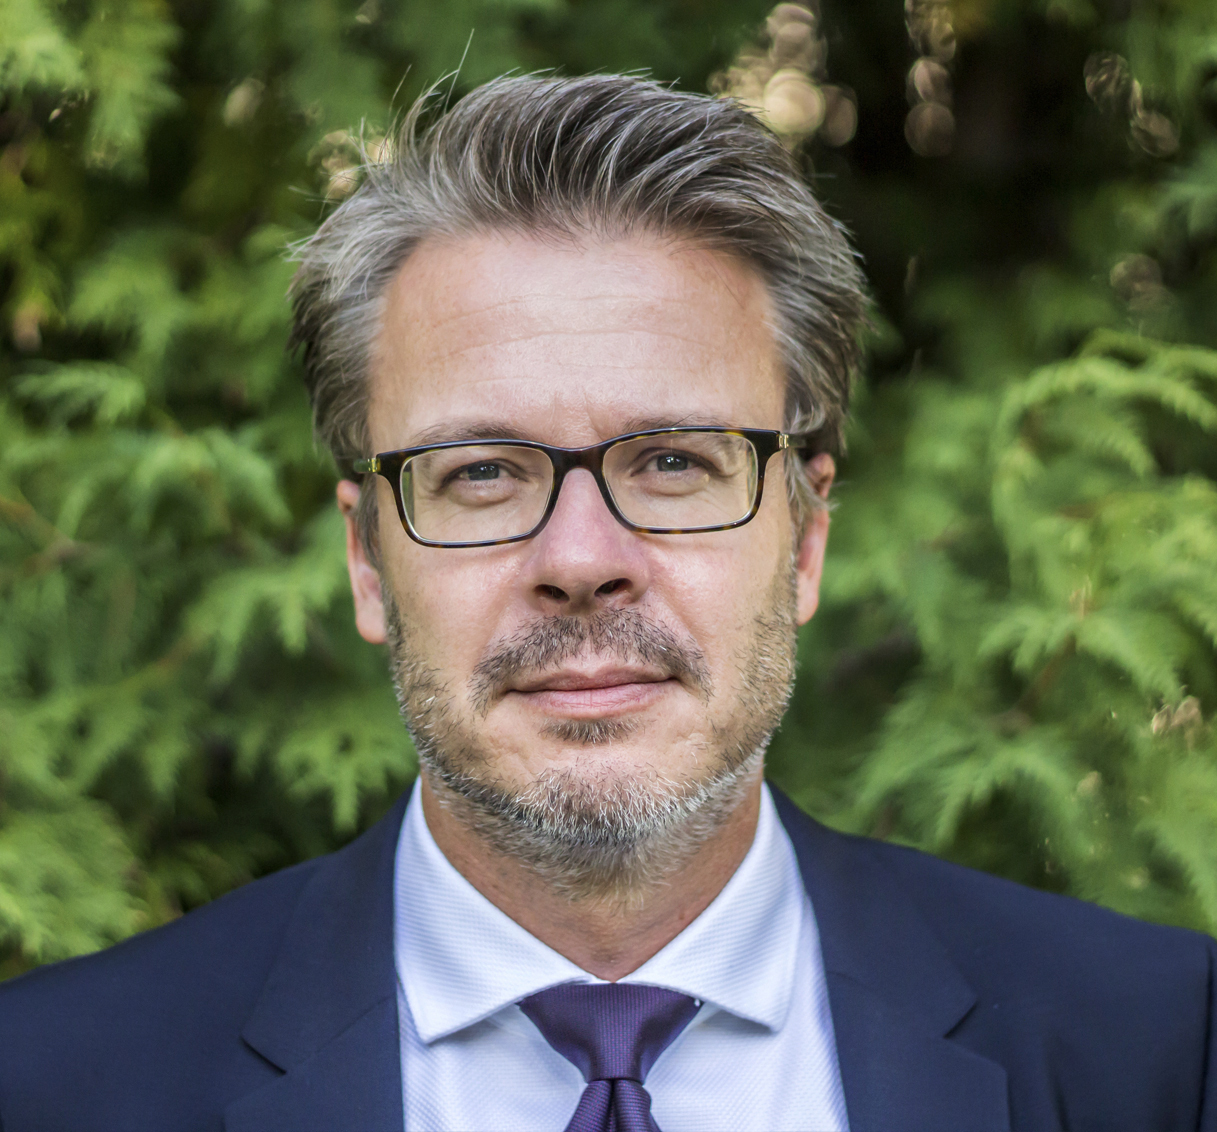 Professor Schumacher